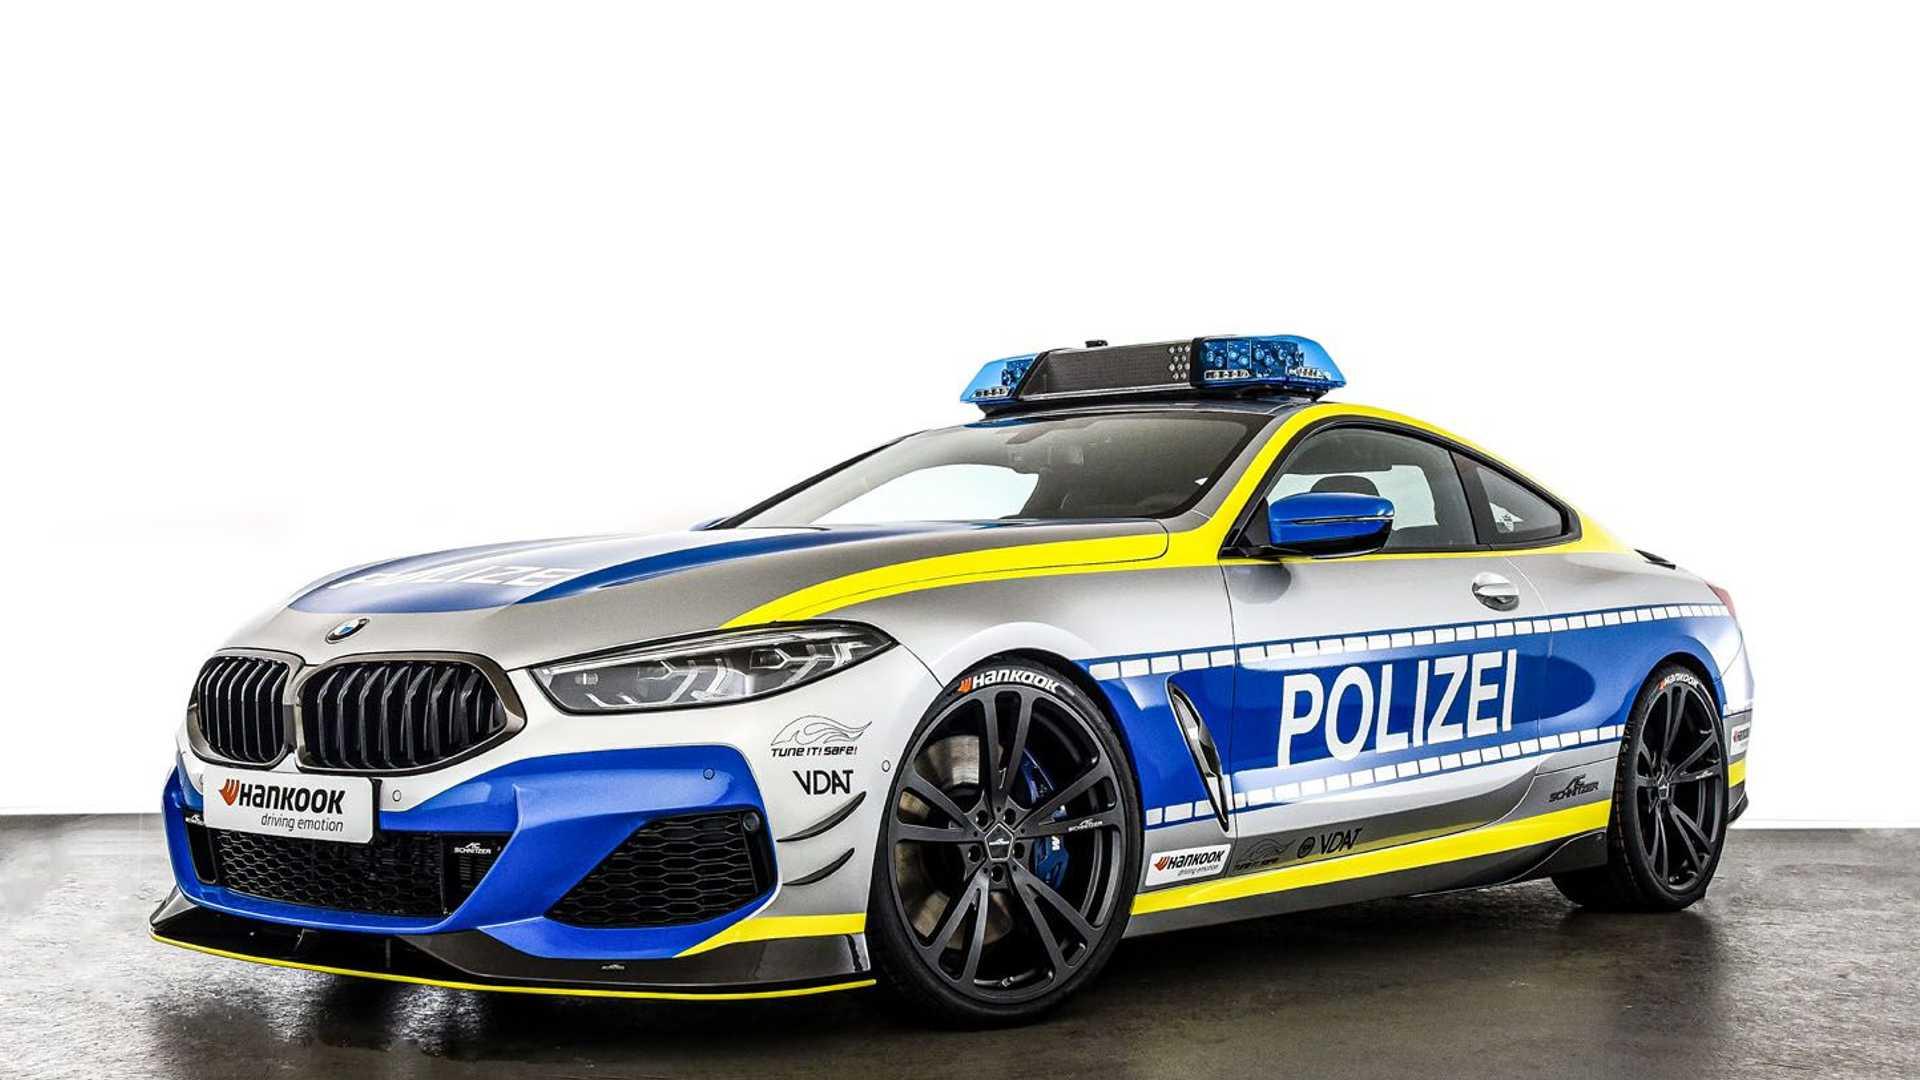 BMW-M850i-police-car-tune-it-safe-9